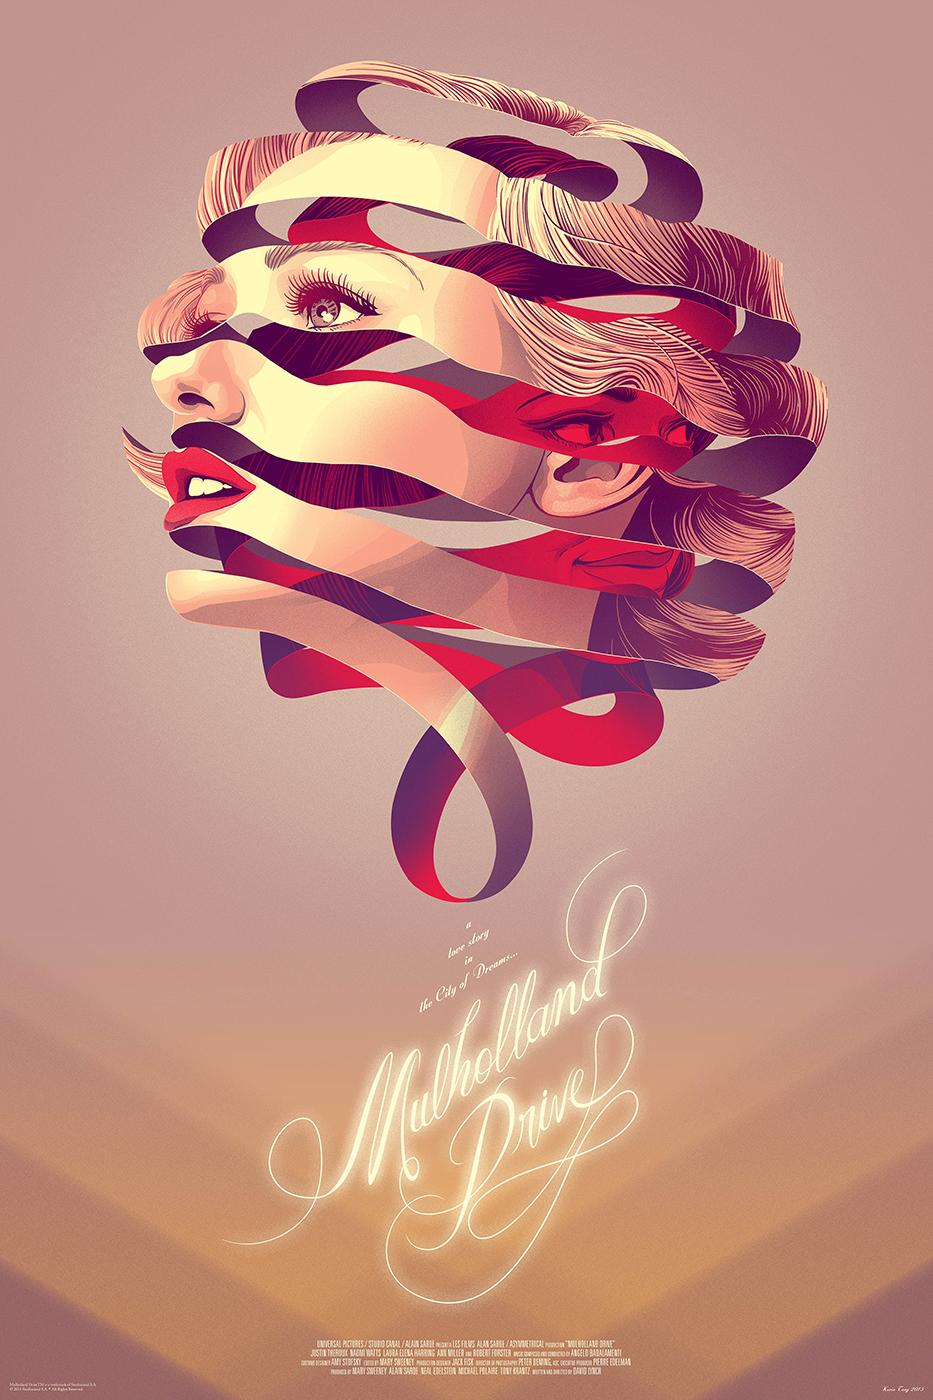 6 mustsee posters from mondocon �crimson peak� �masters